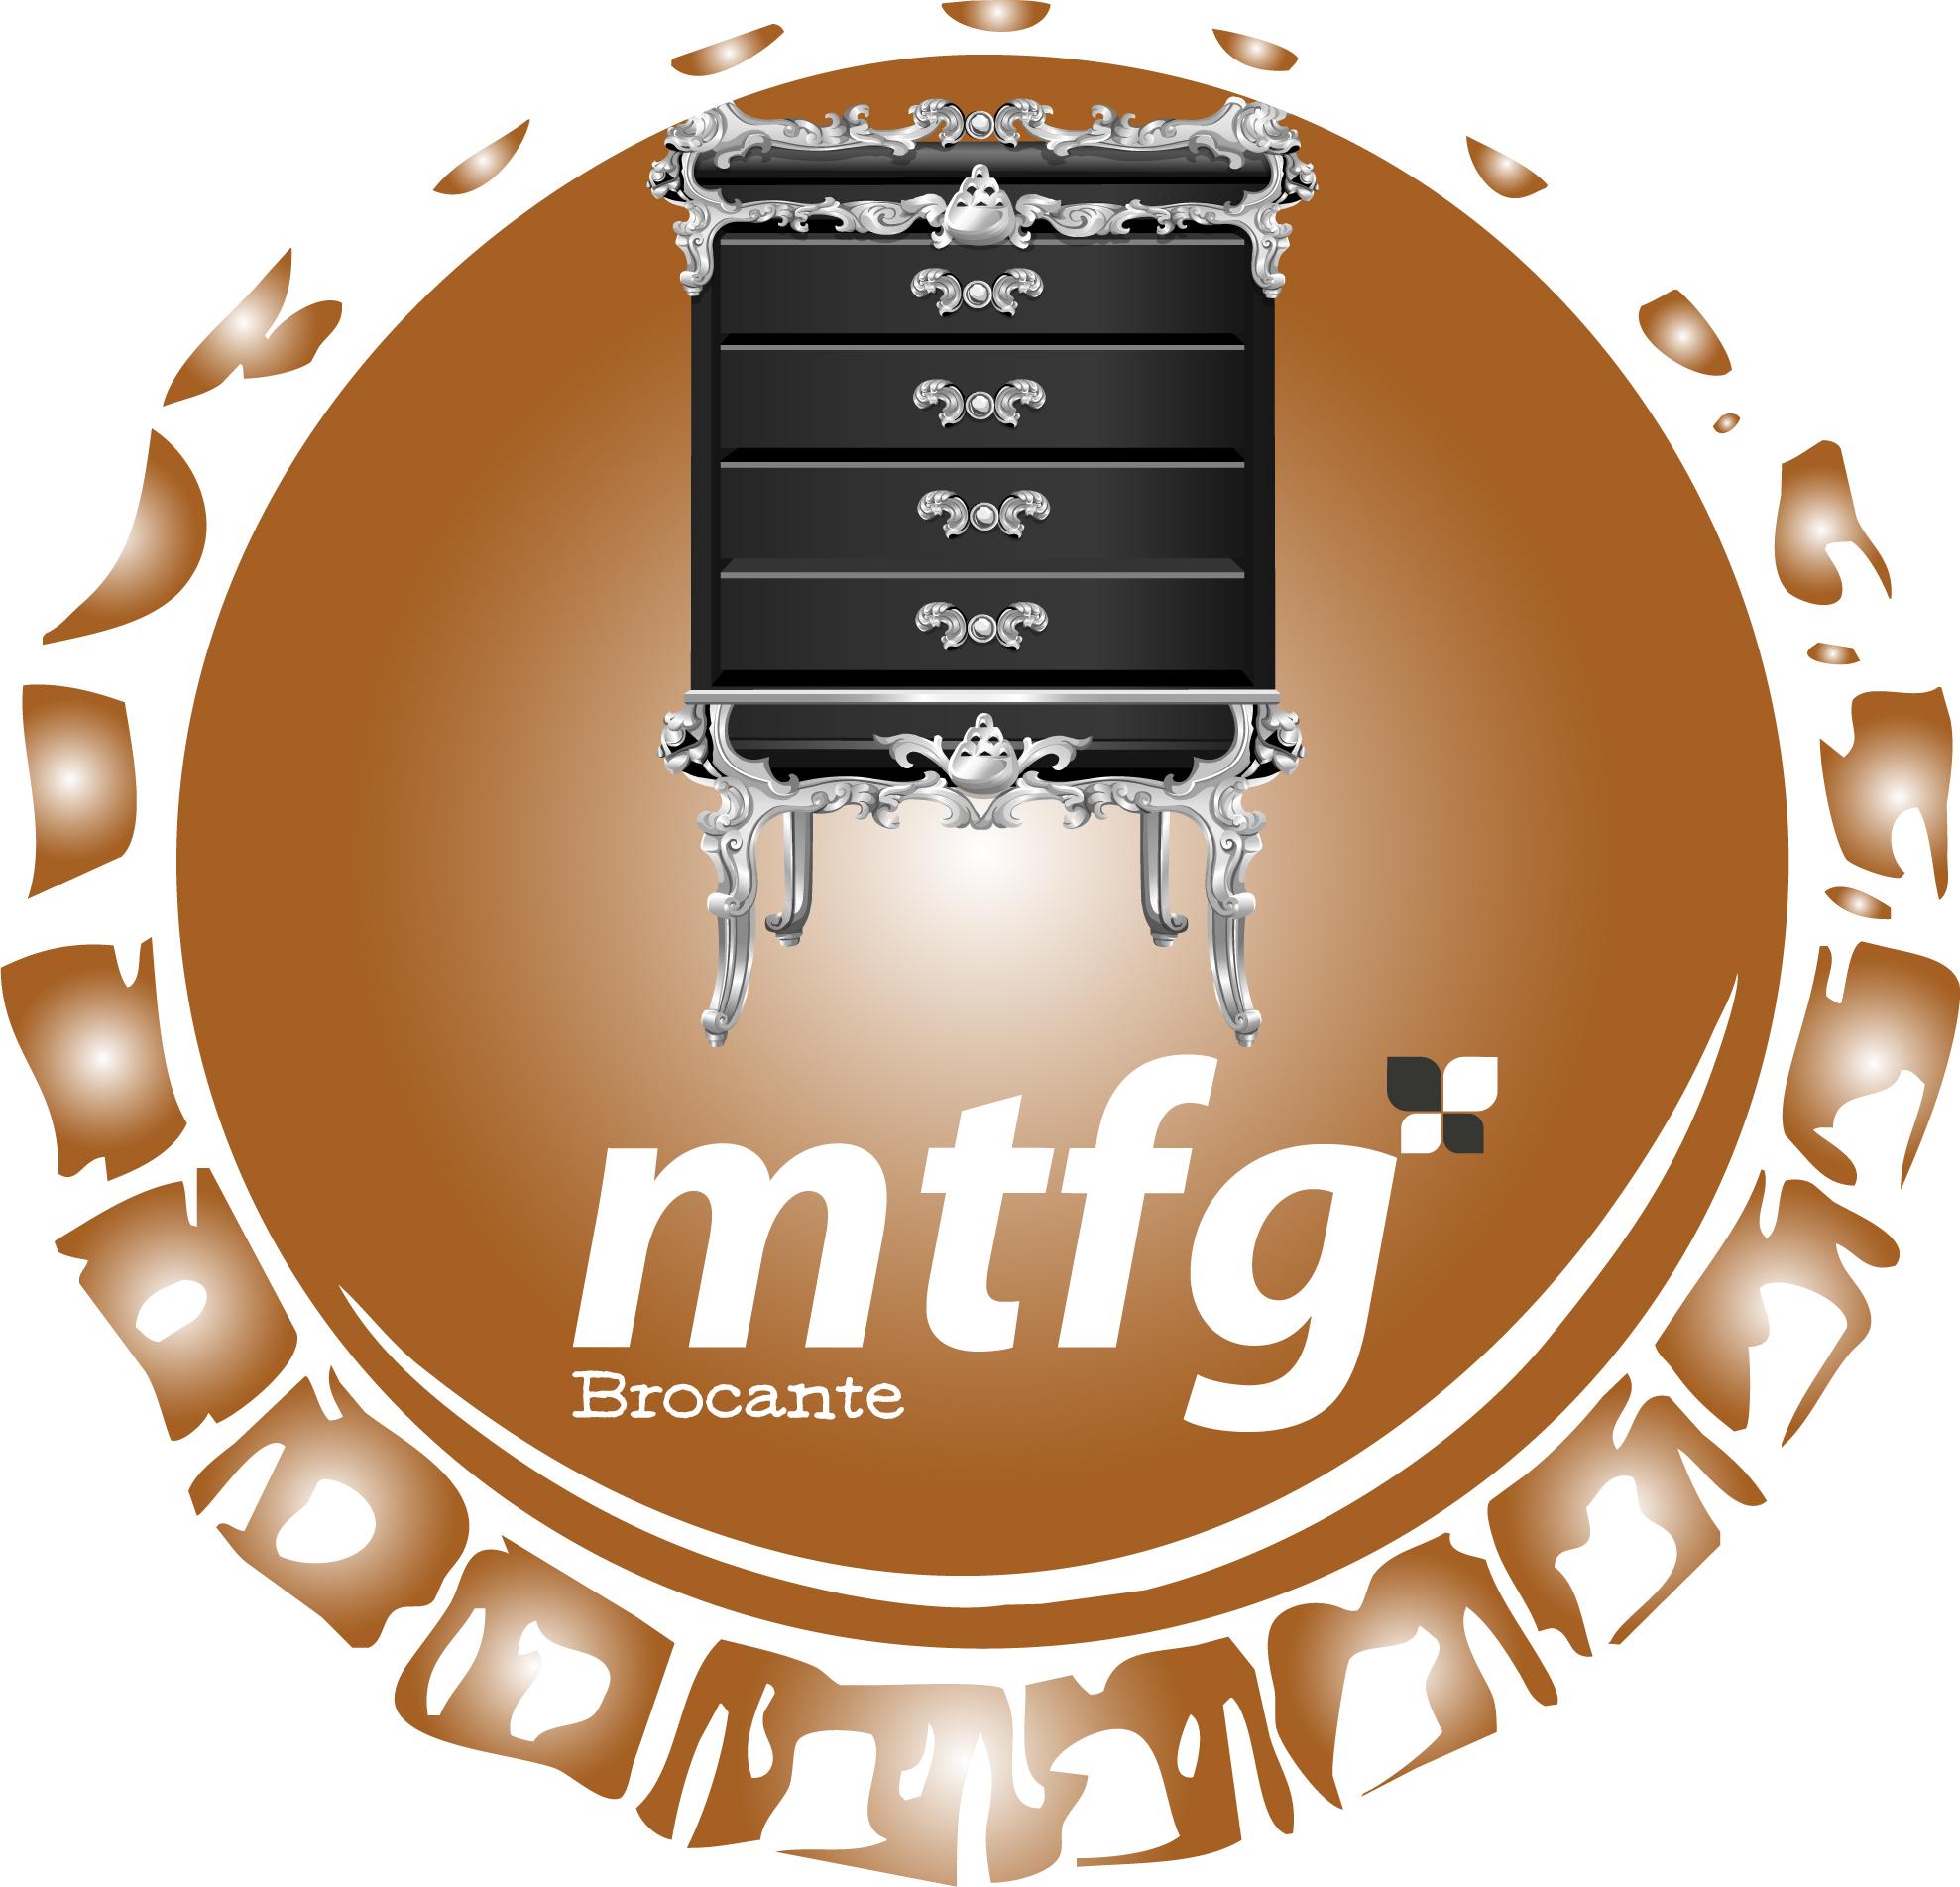 MTFG Brocante